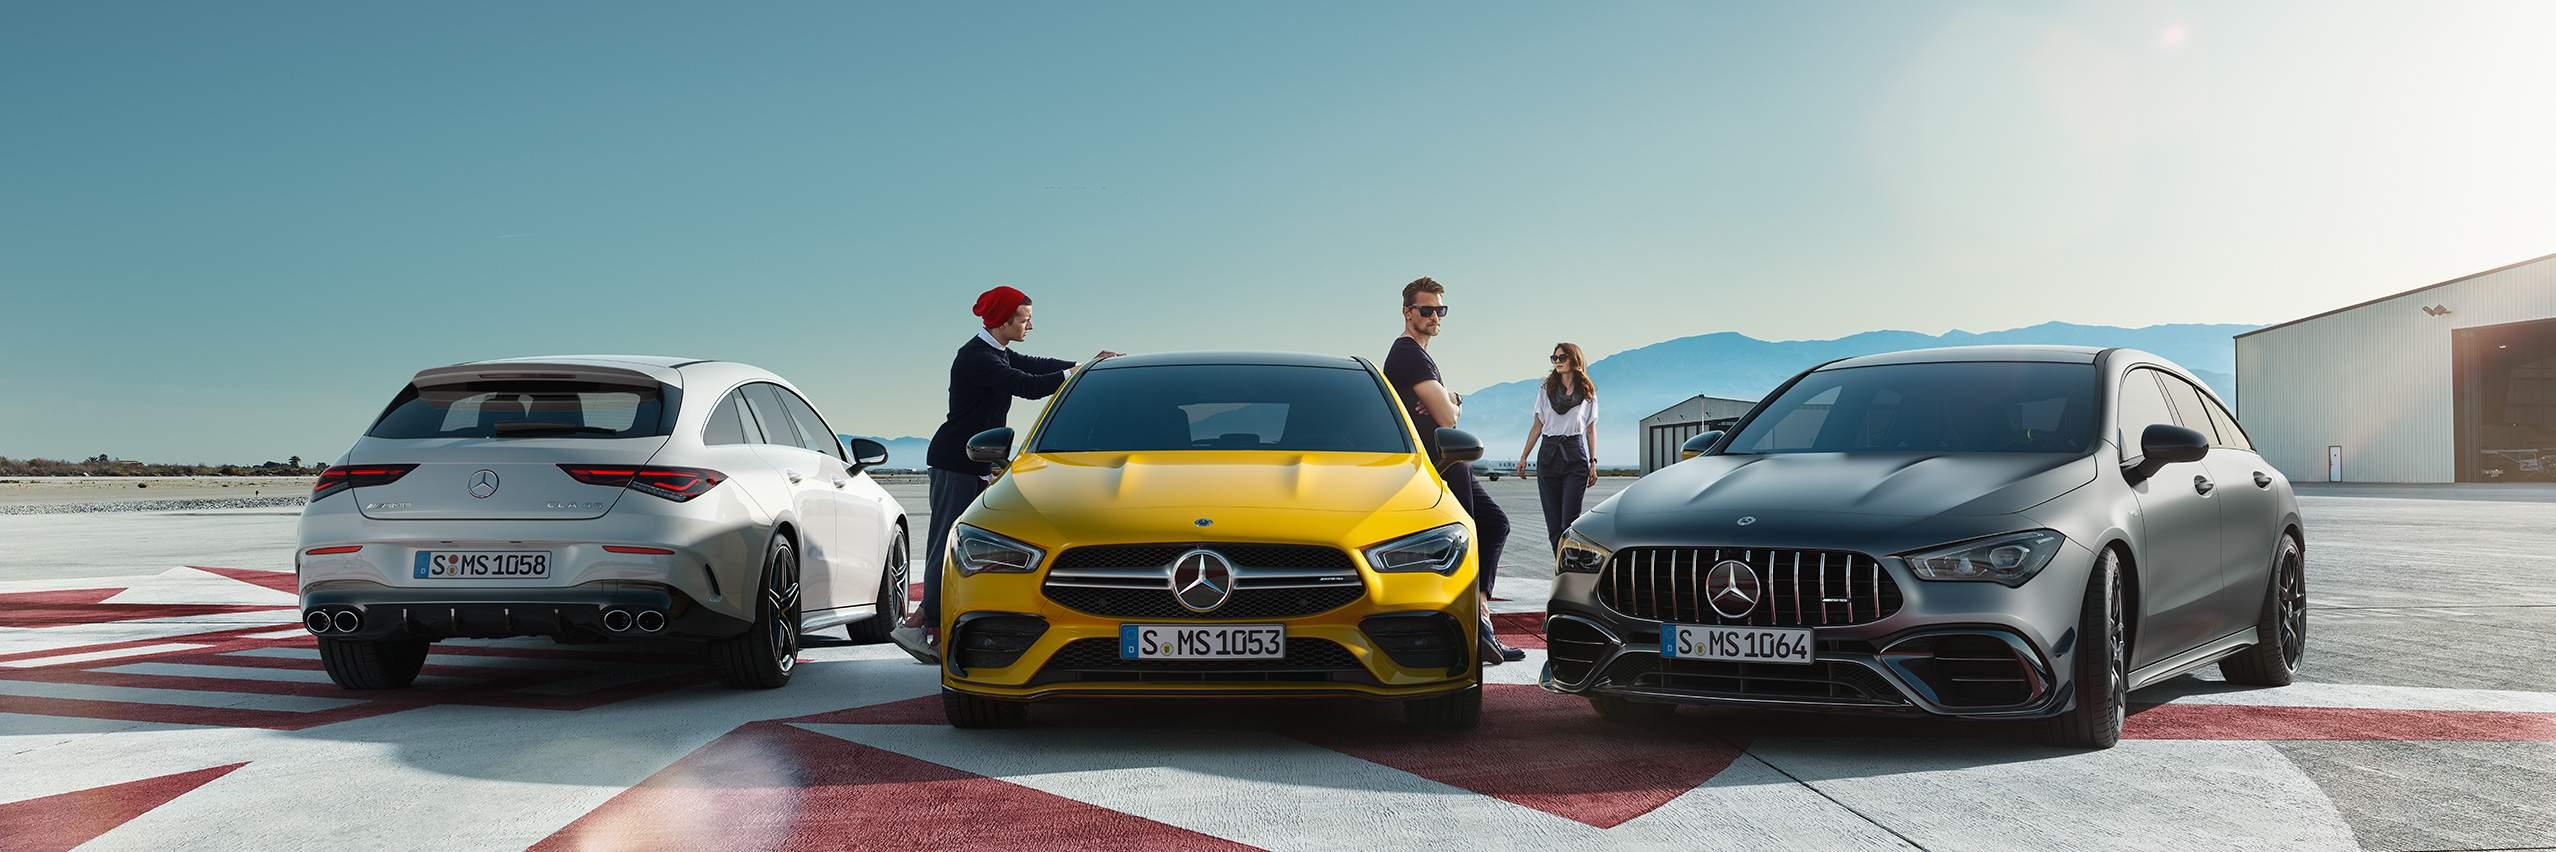 CAR-Avenue-Mercedes-AMG-CLA-Shooting-Brake-07